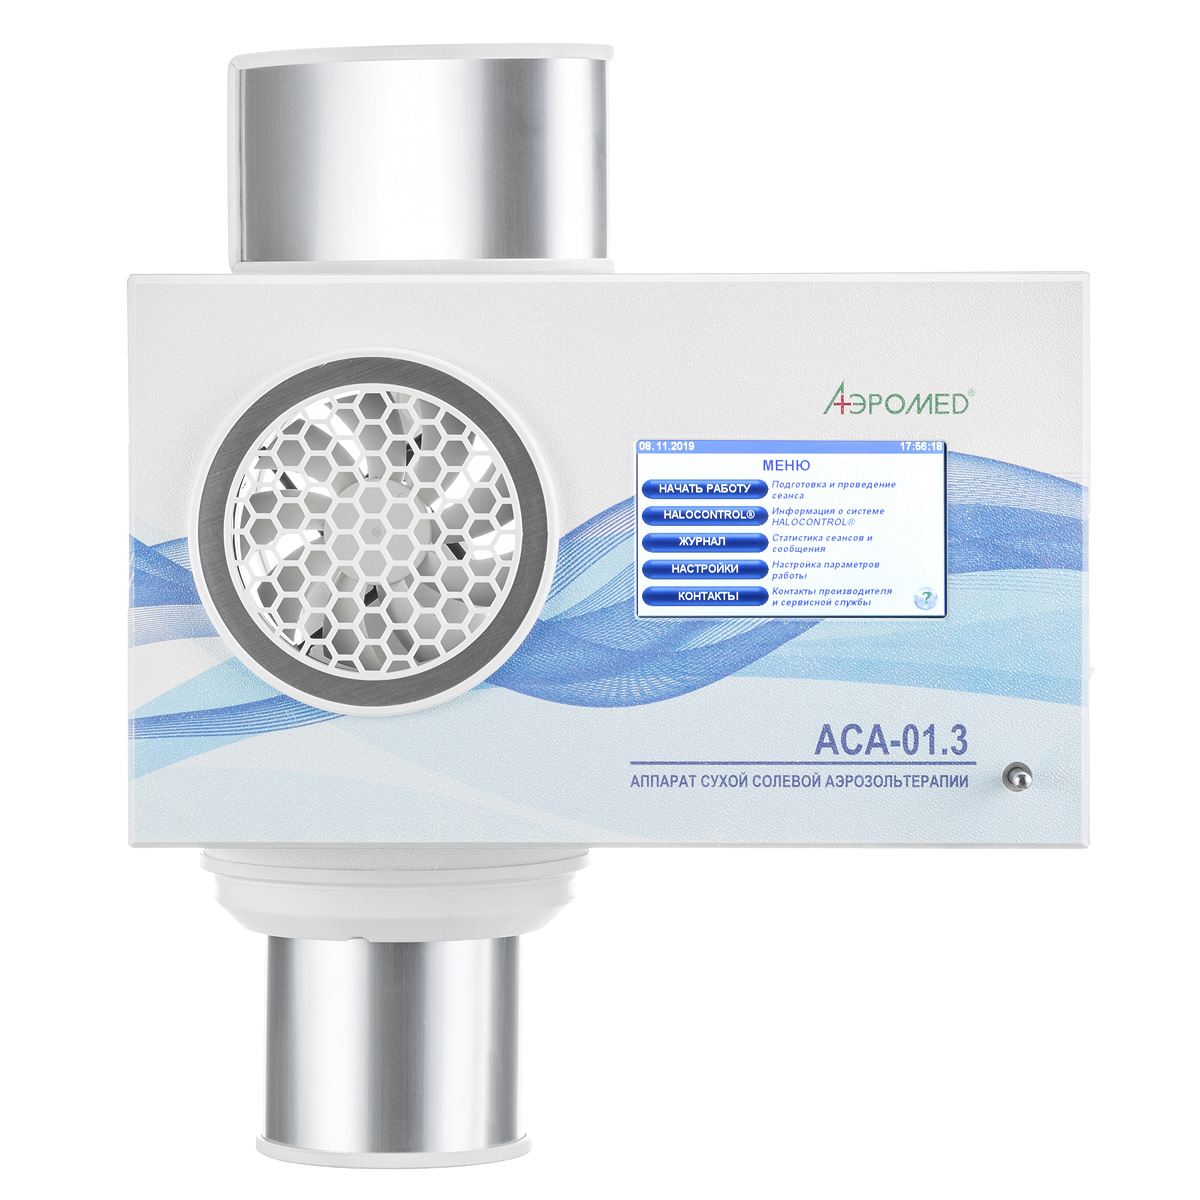 Галогенератор АСА-01.3 (ГалоСМАРТ)